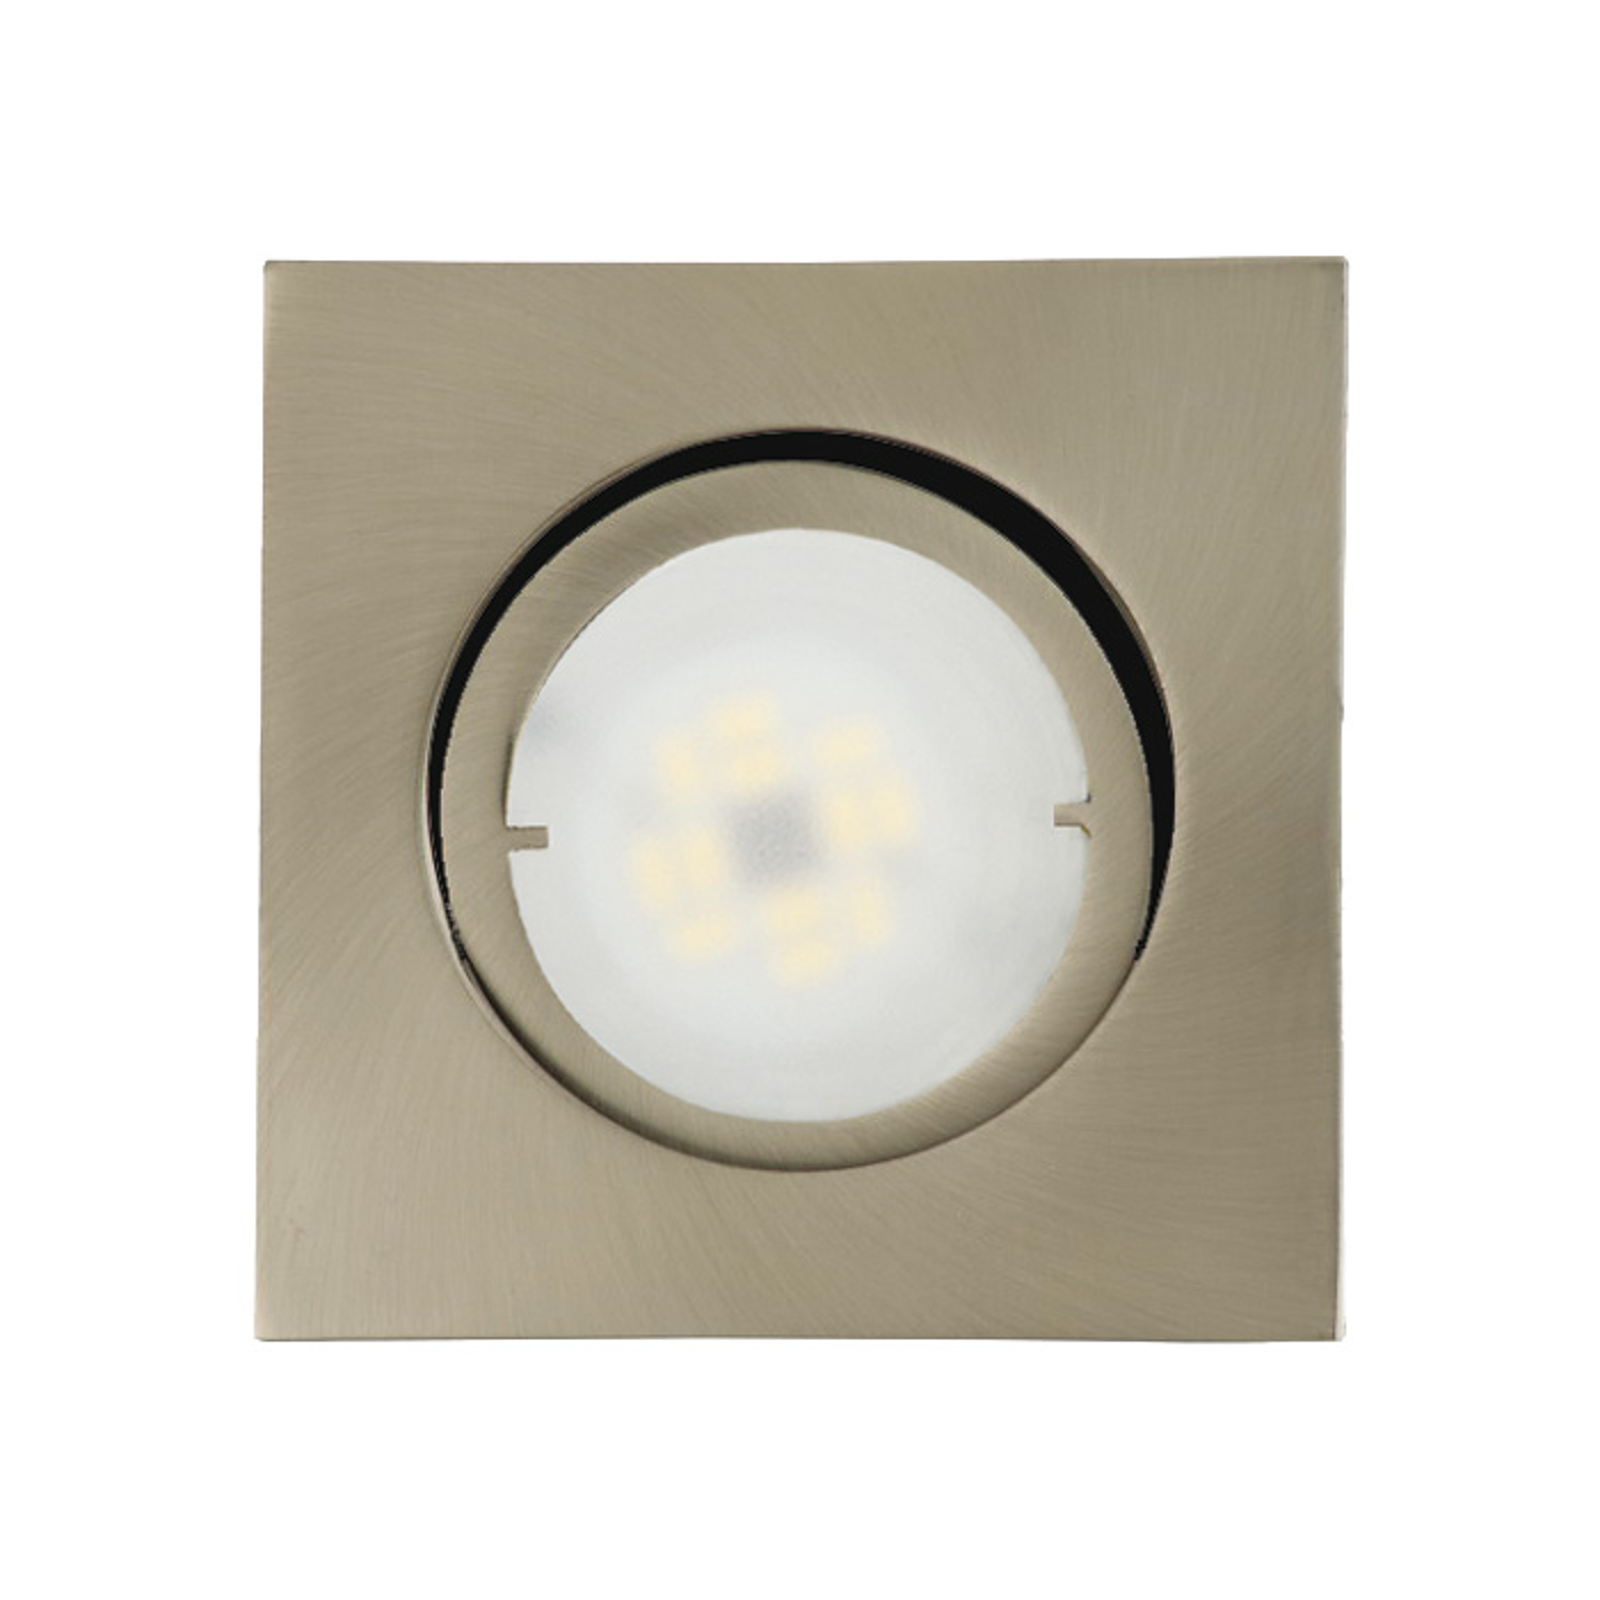 Joanie - LED inbouwlamp, ijzer geborsteld